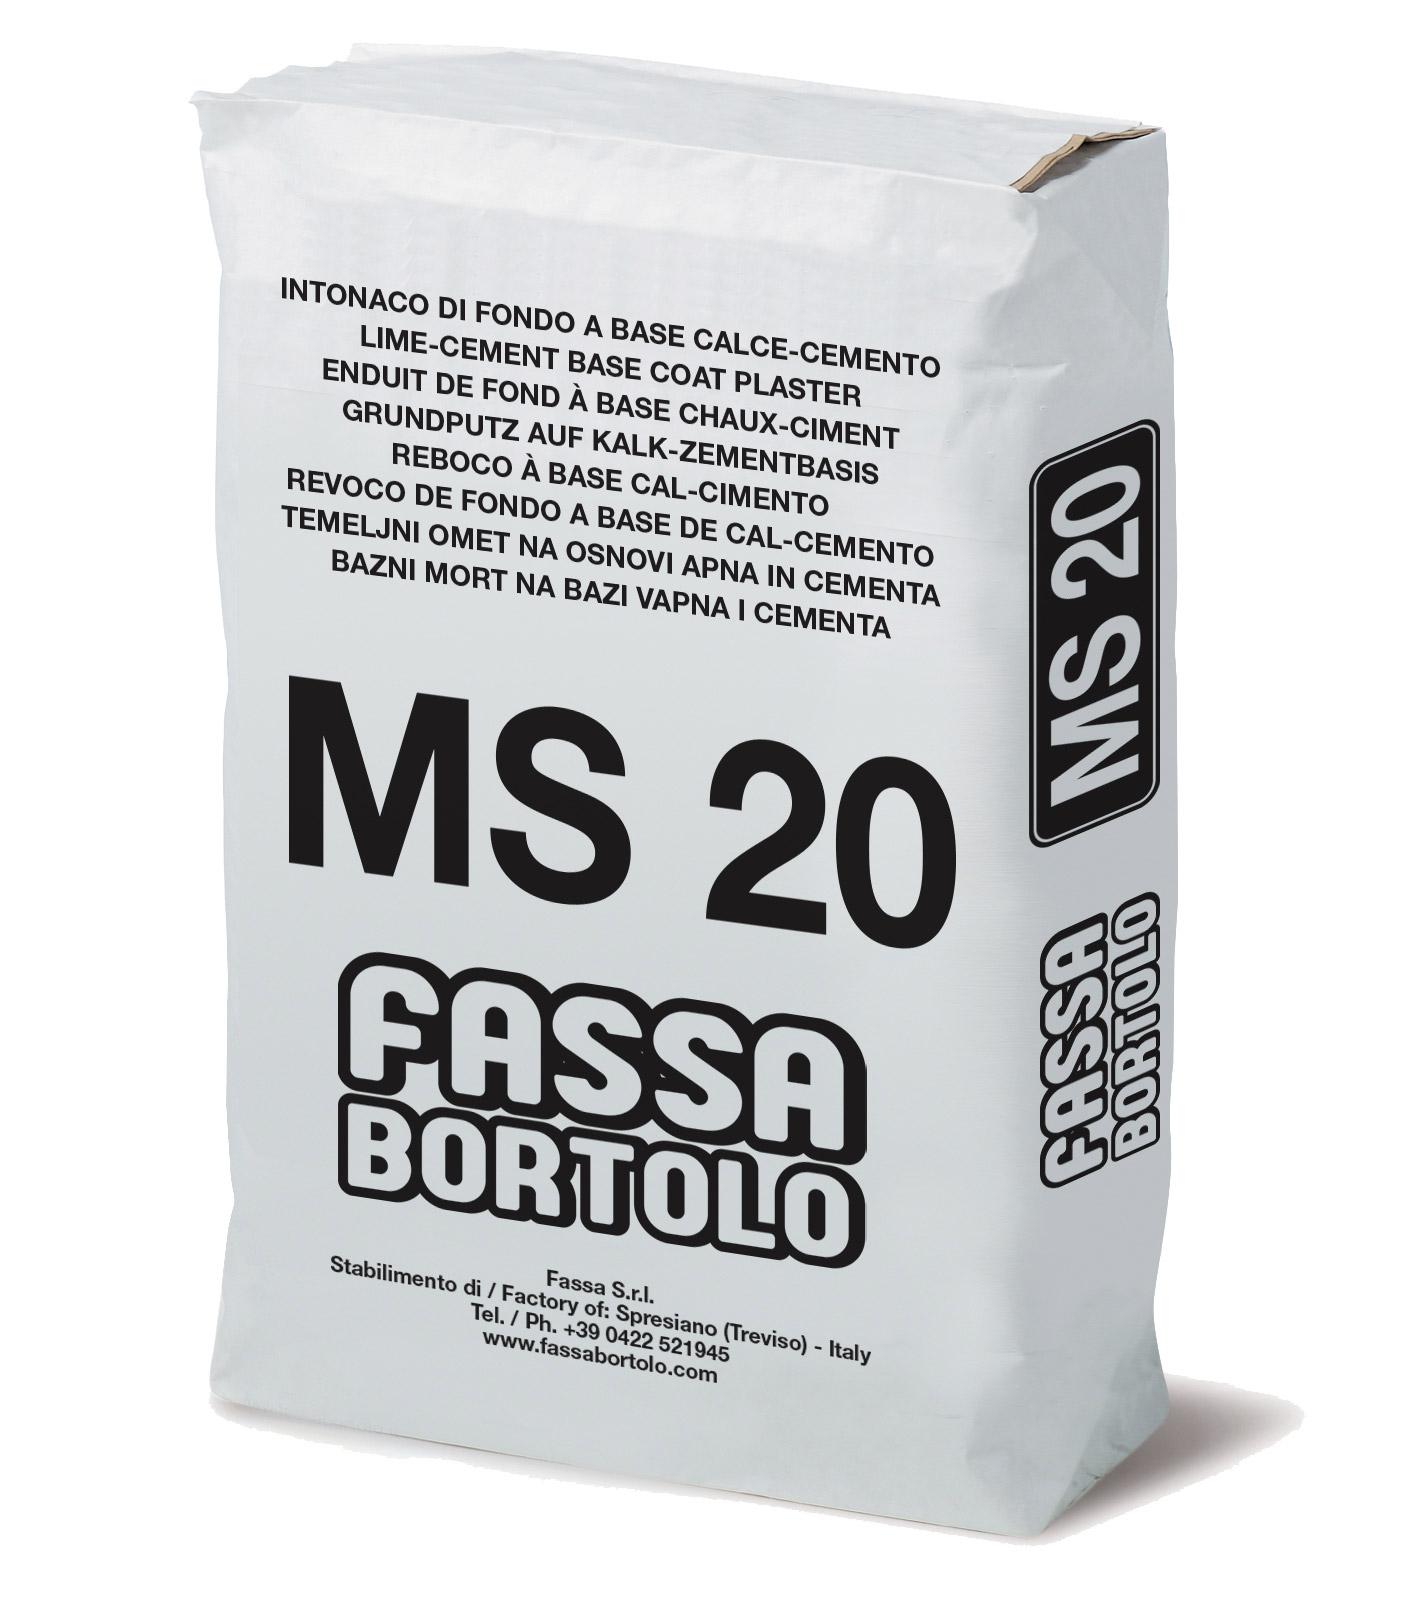 MS 20